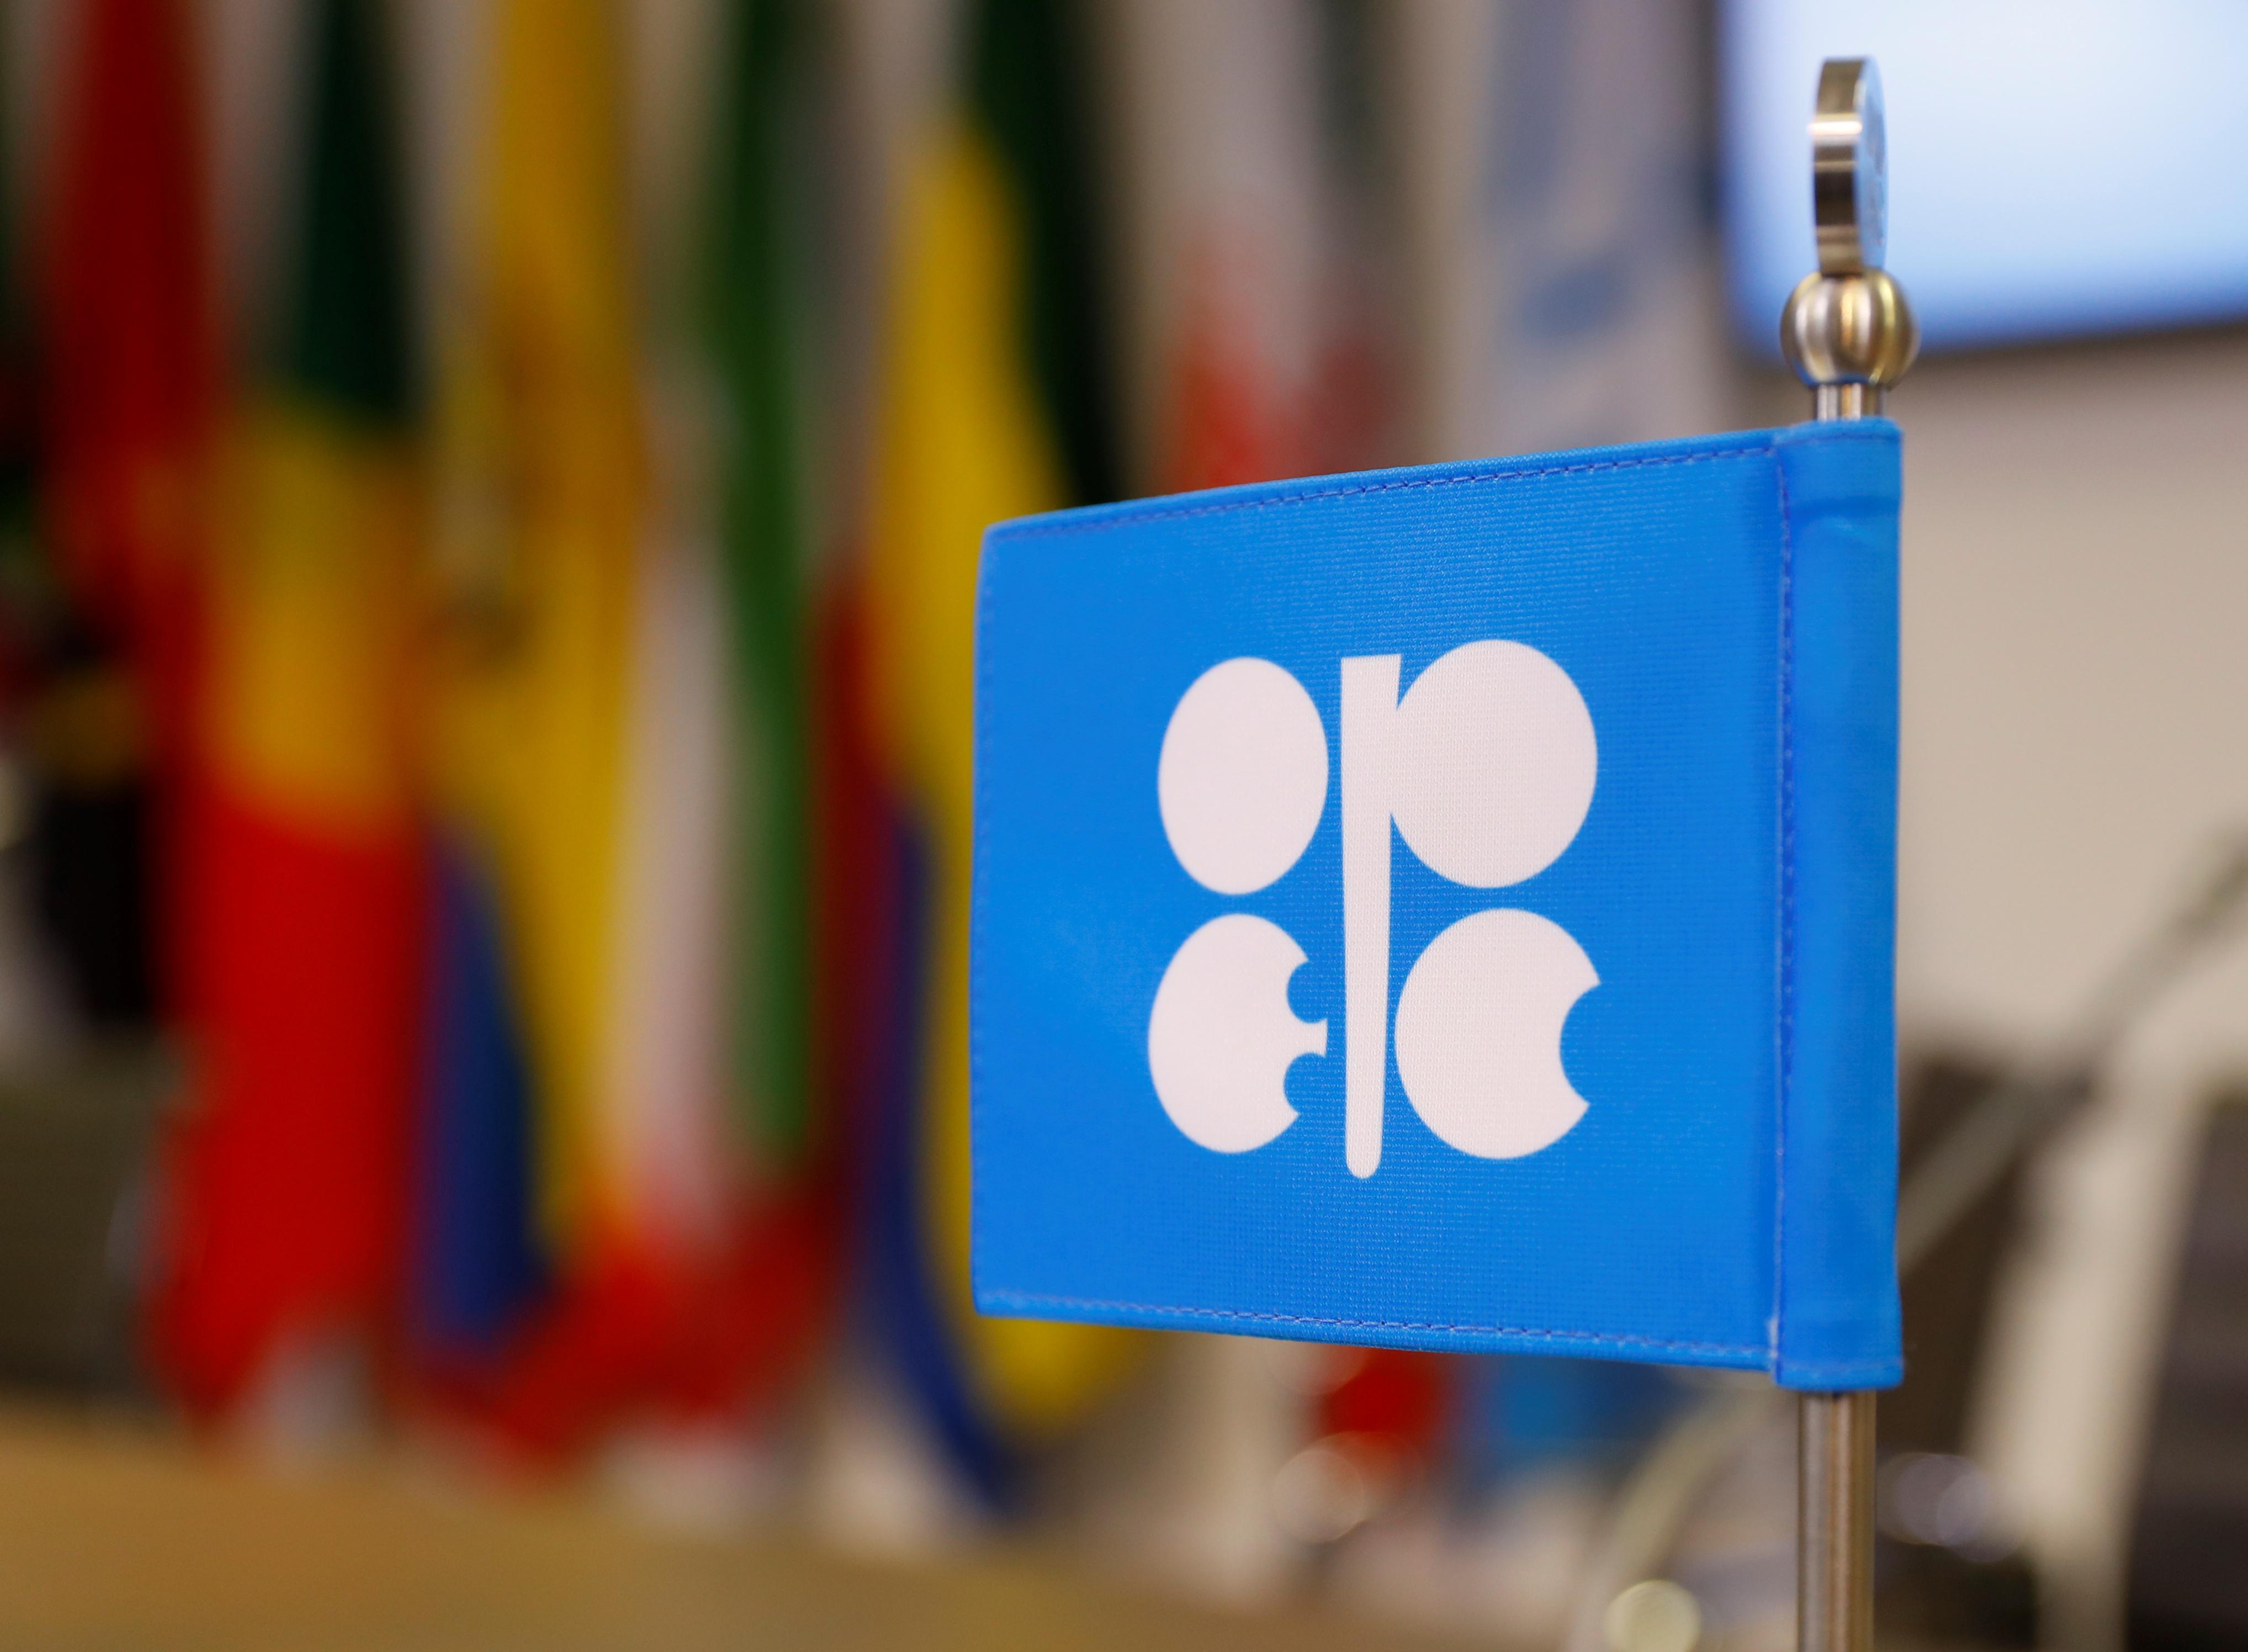 The OPEC logo is seen in Vienna, Austria, December 7, 2018. REUTERS/Leonhard Foeger